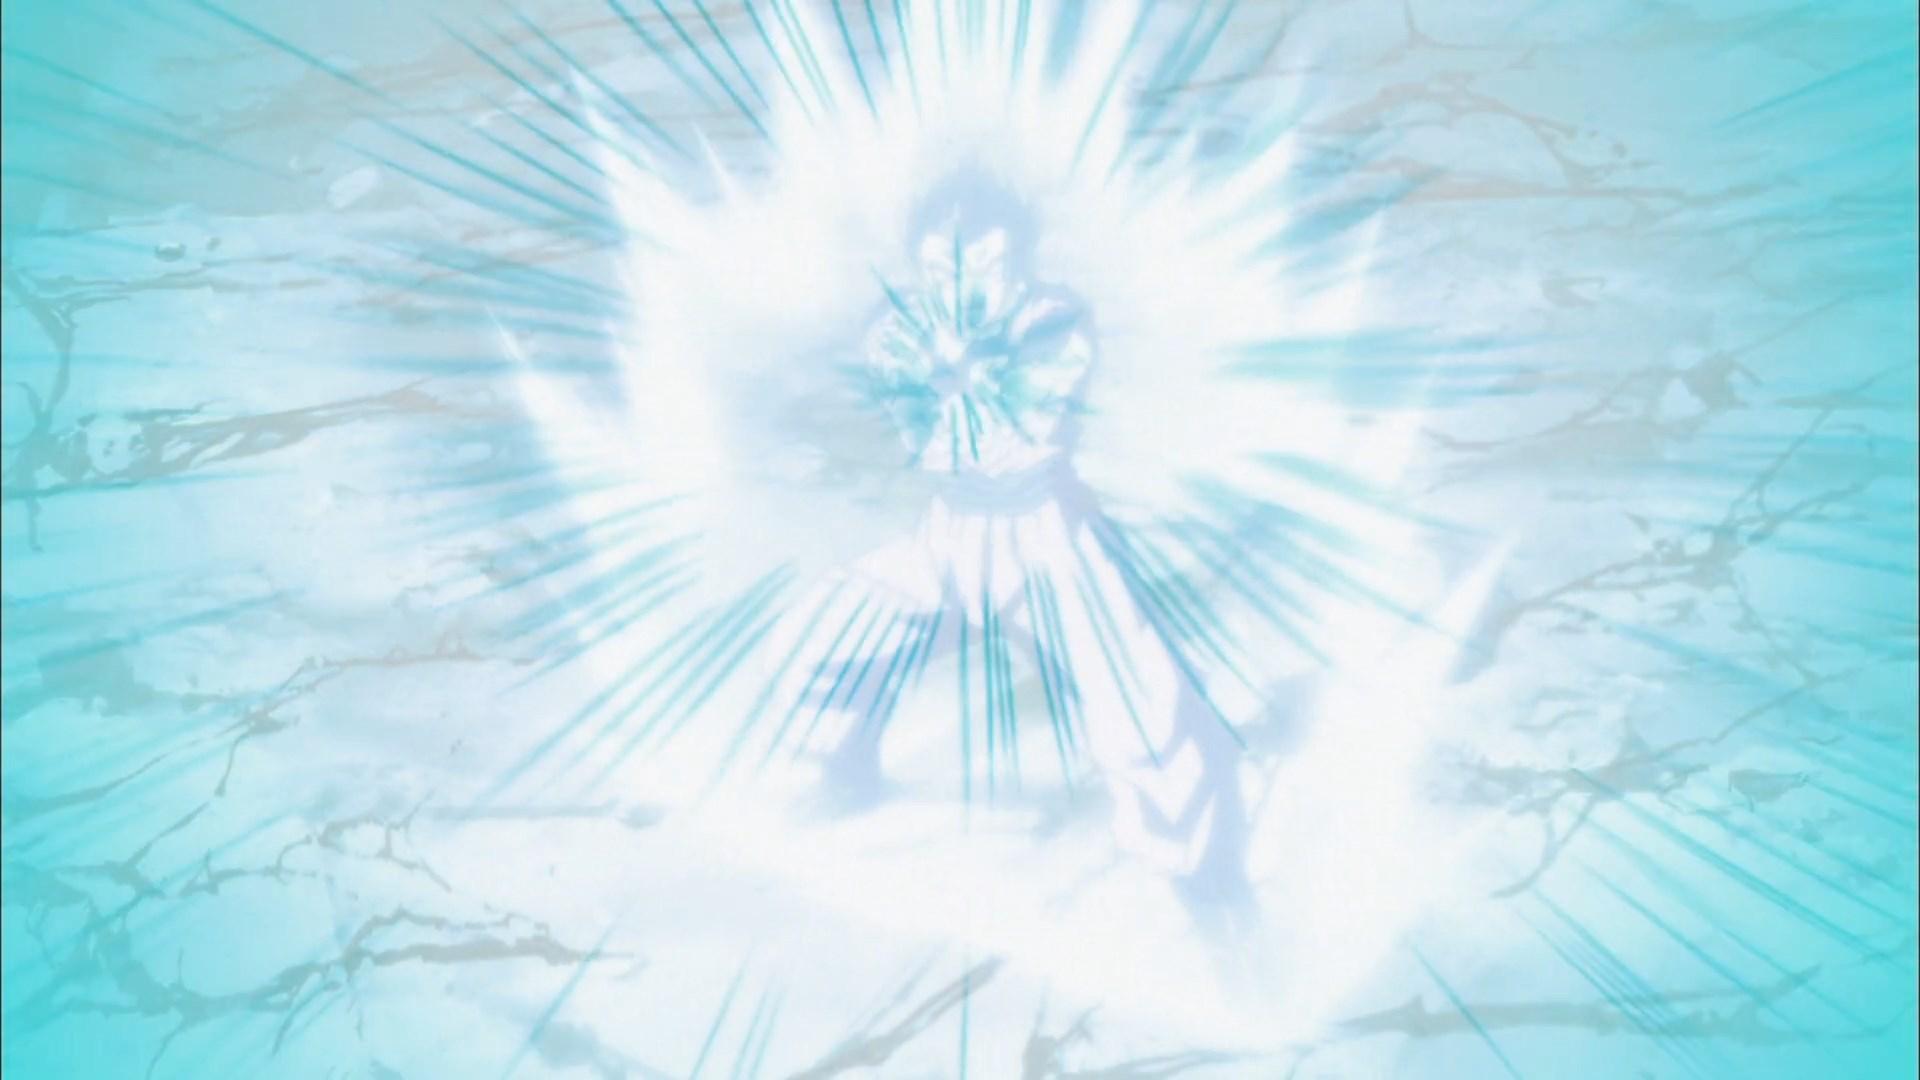 [HorribleSubs] Dragon Ball Super - 121 [1080p].mkv_snapshot_17.15